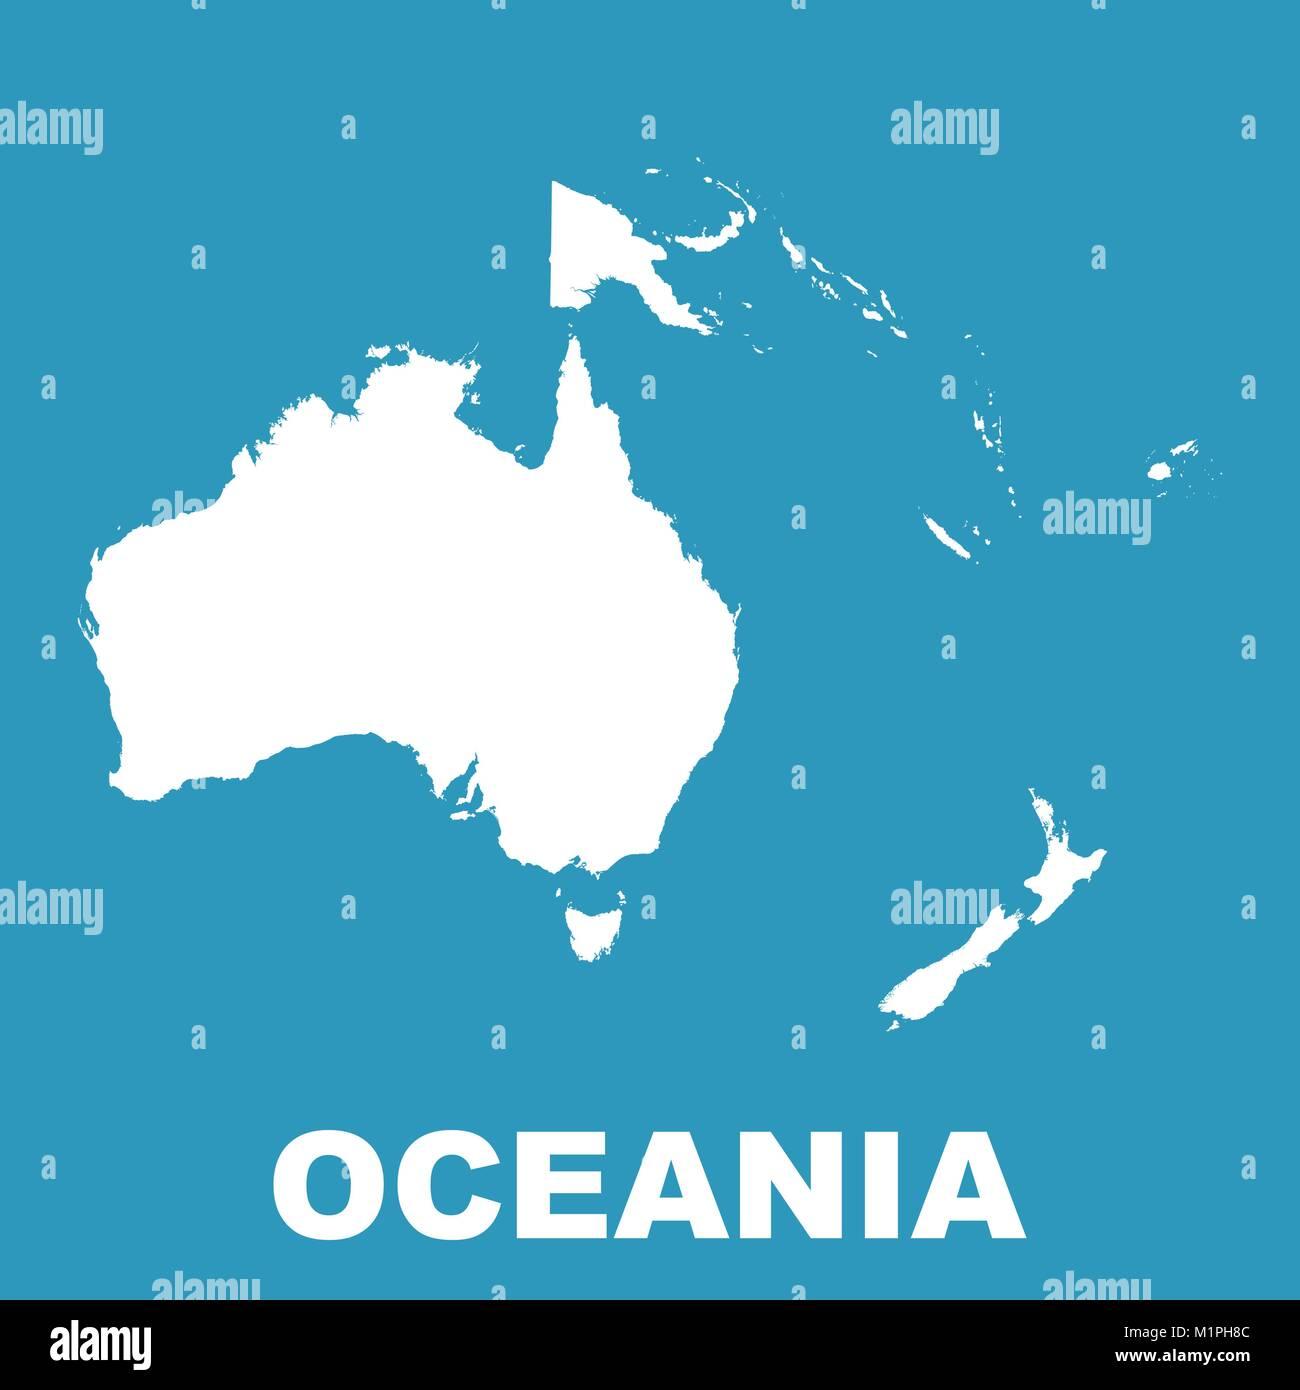 Australia Oceania: Oceania Map Stock Photos & Oceania Map Stock Images